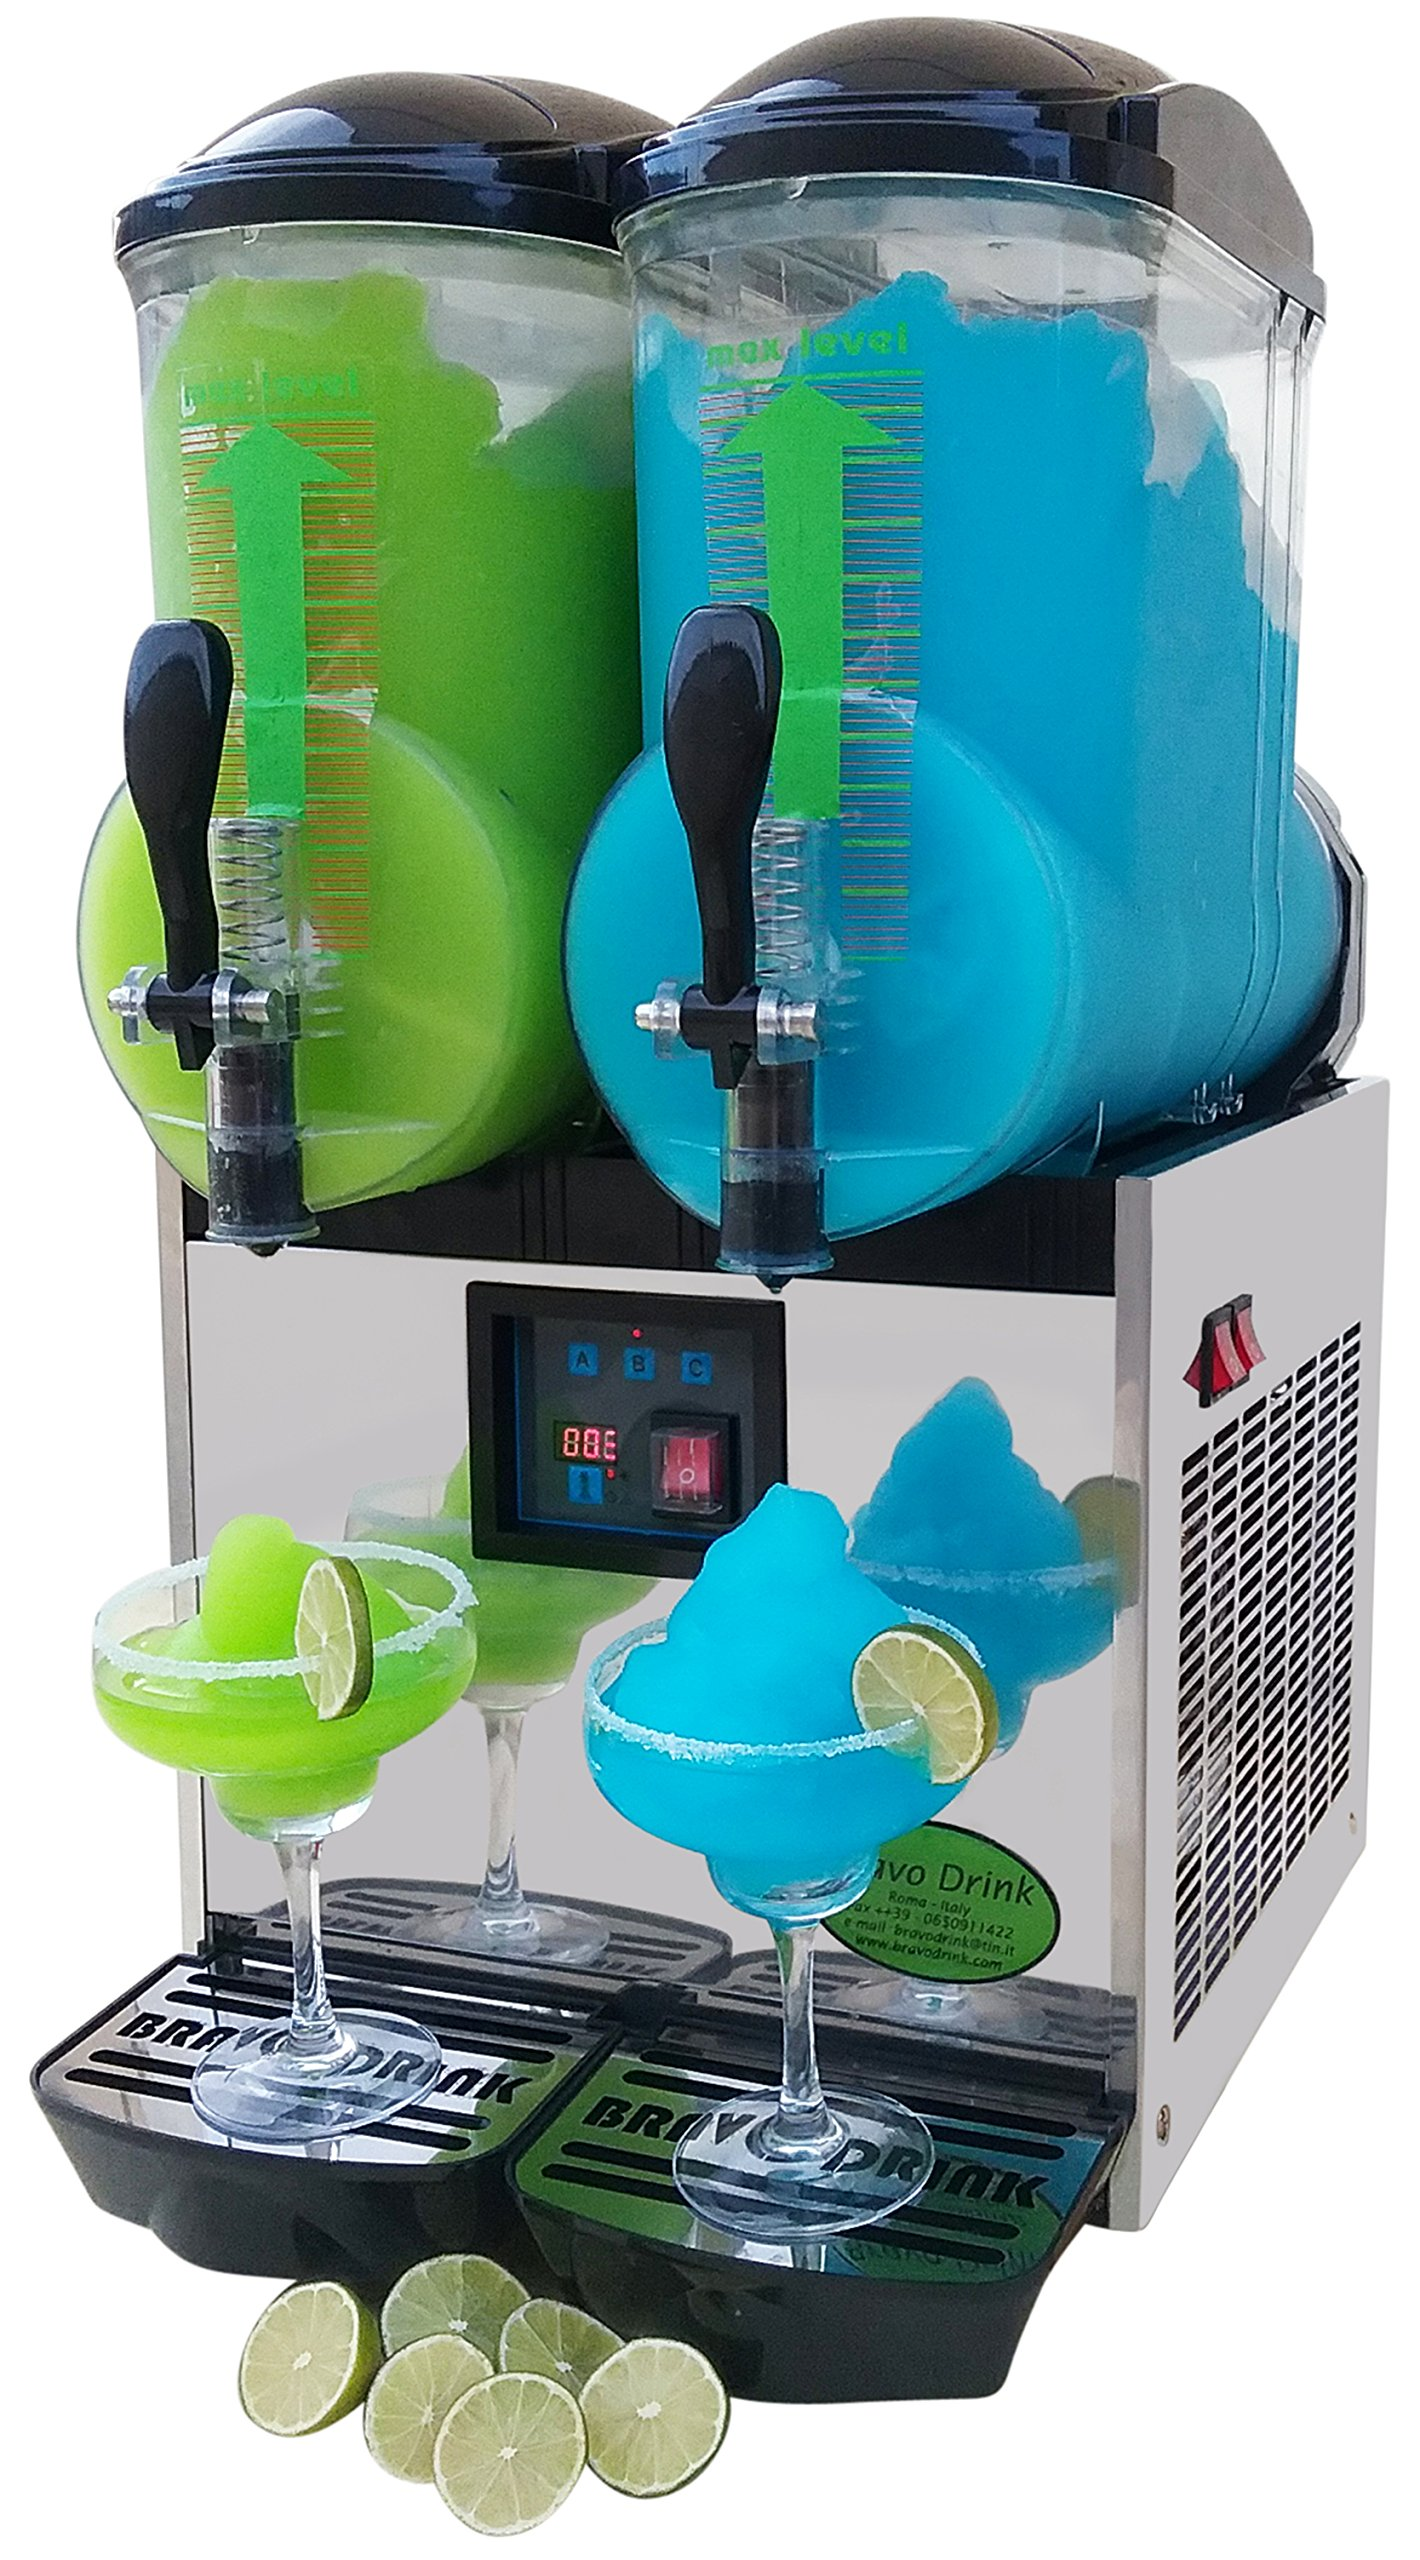 Amazon.com: Brand : BRAVO ITALIA 2 bowls slushie machine 3.2 gallons ...